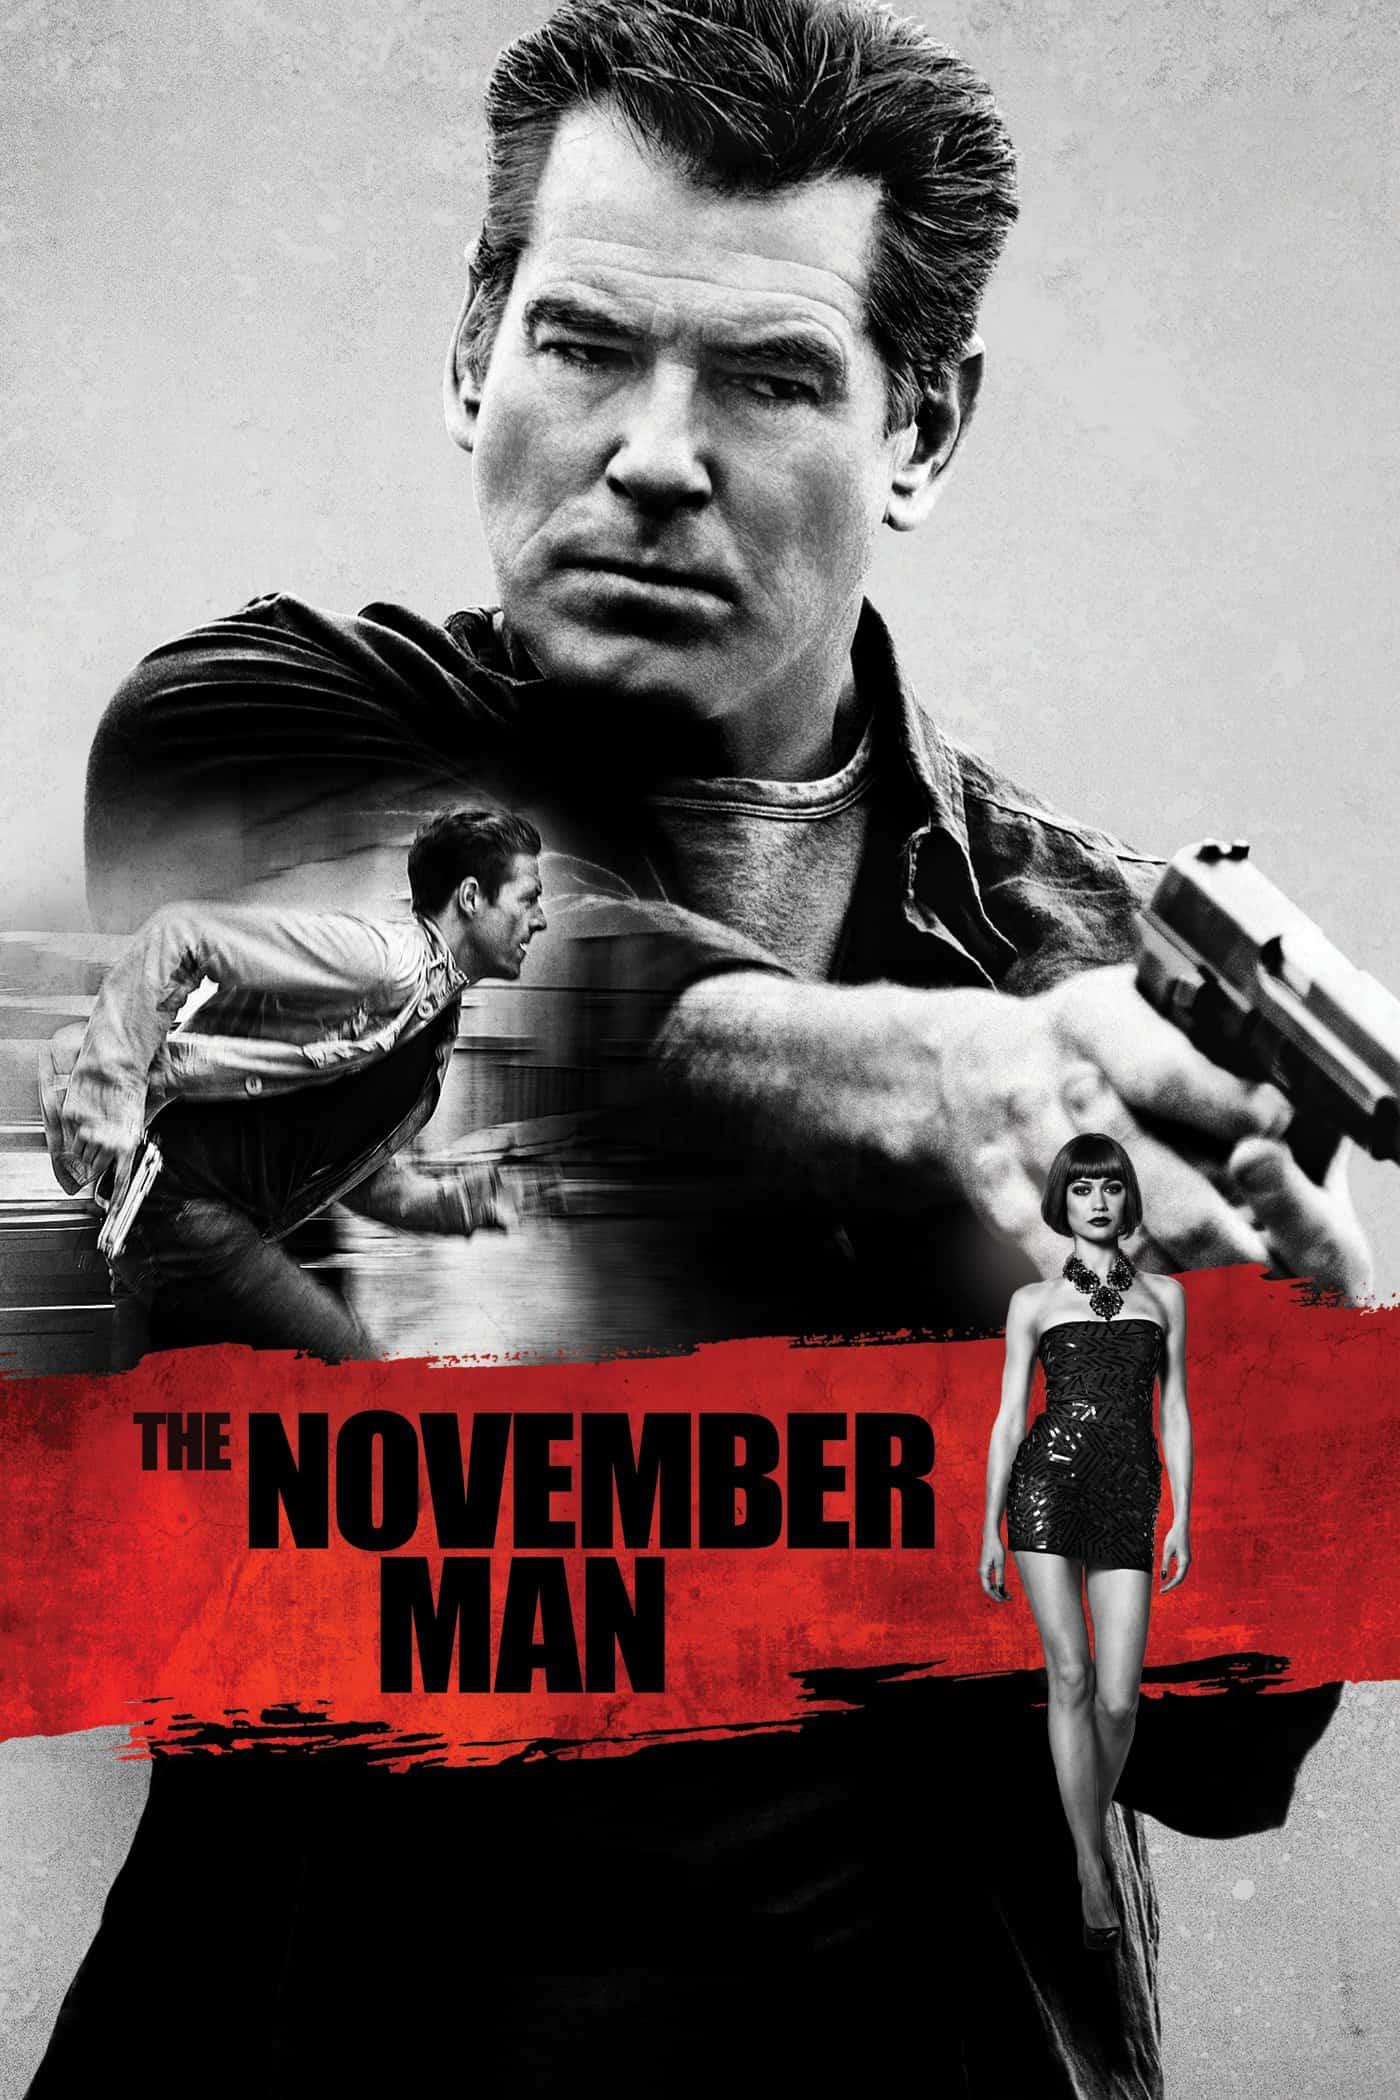 The November Man, 2014